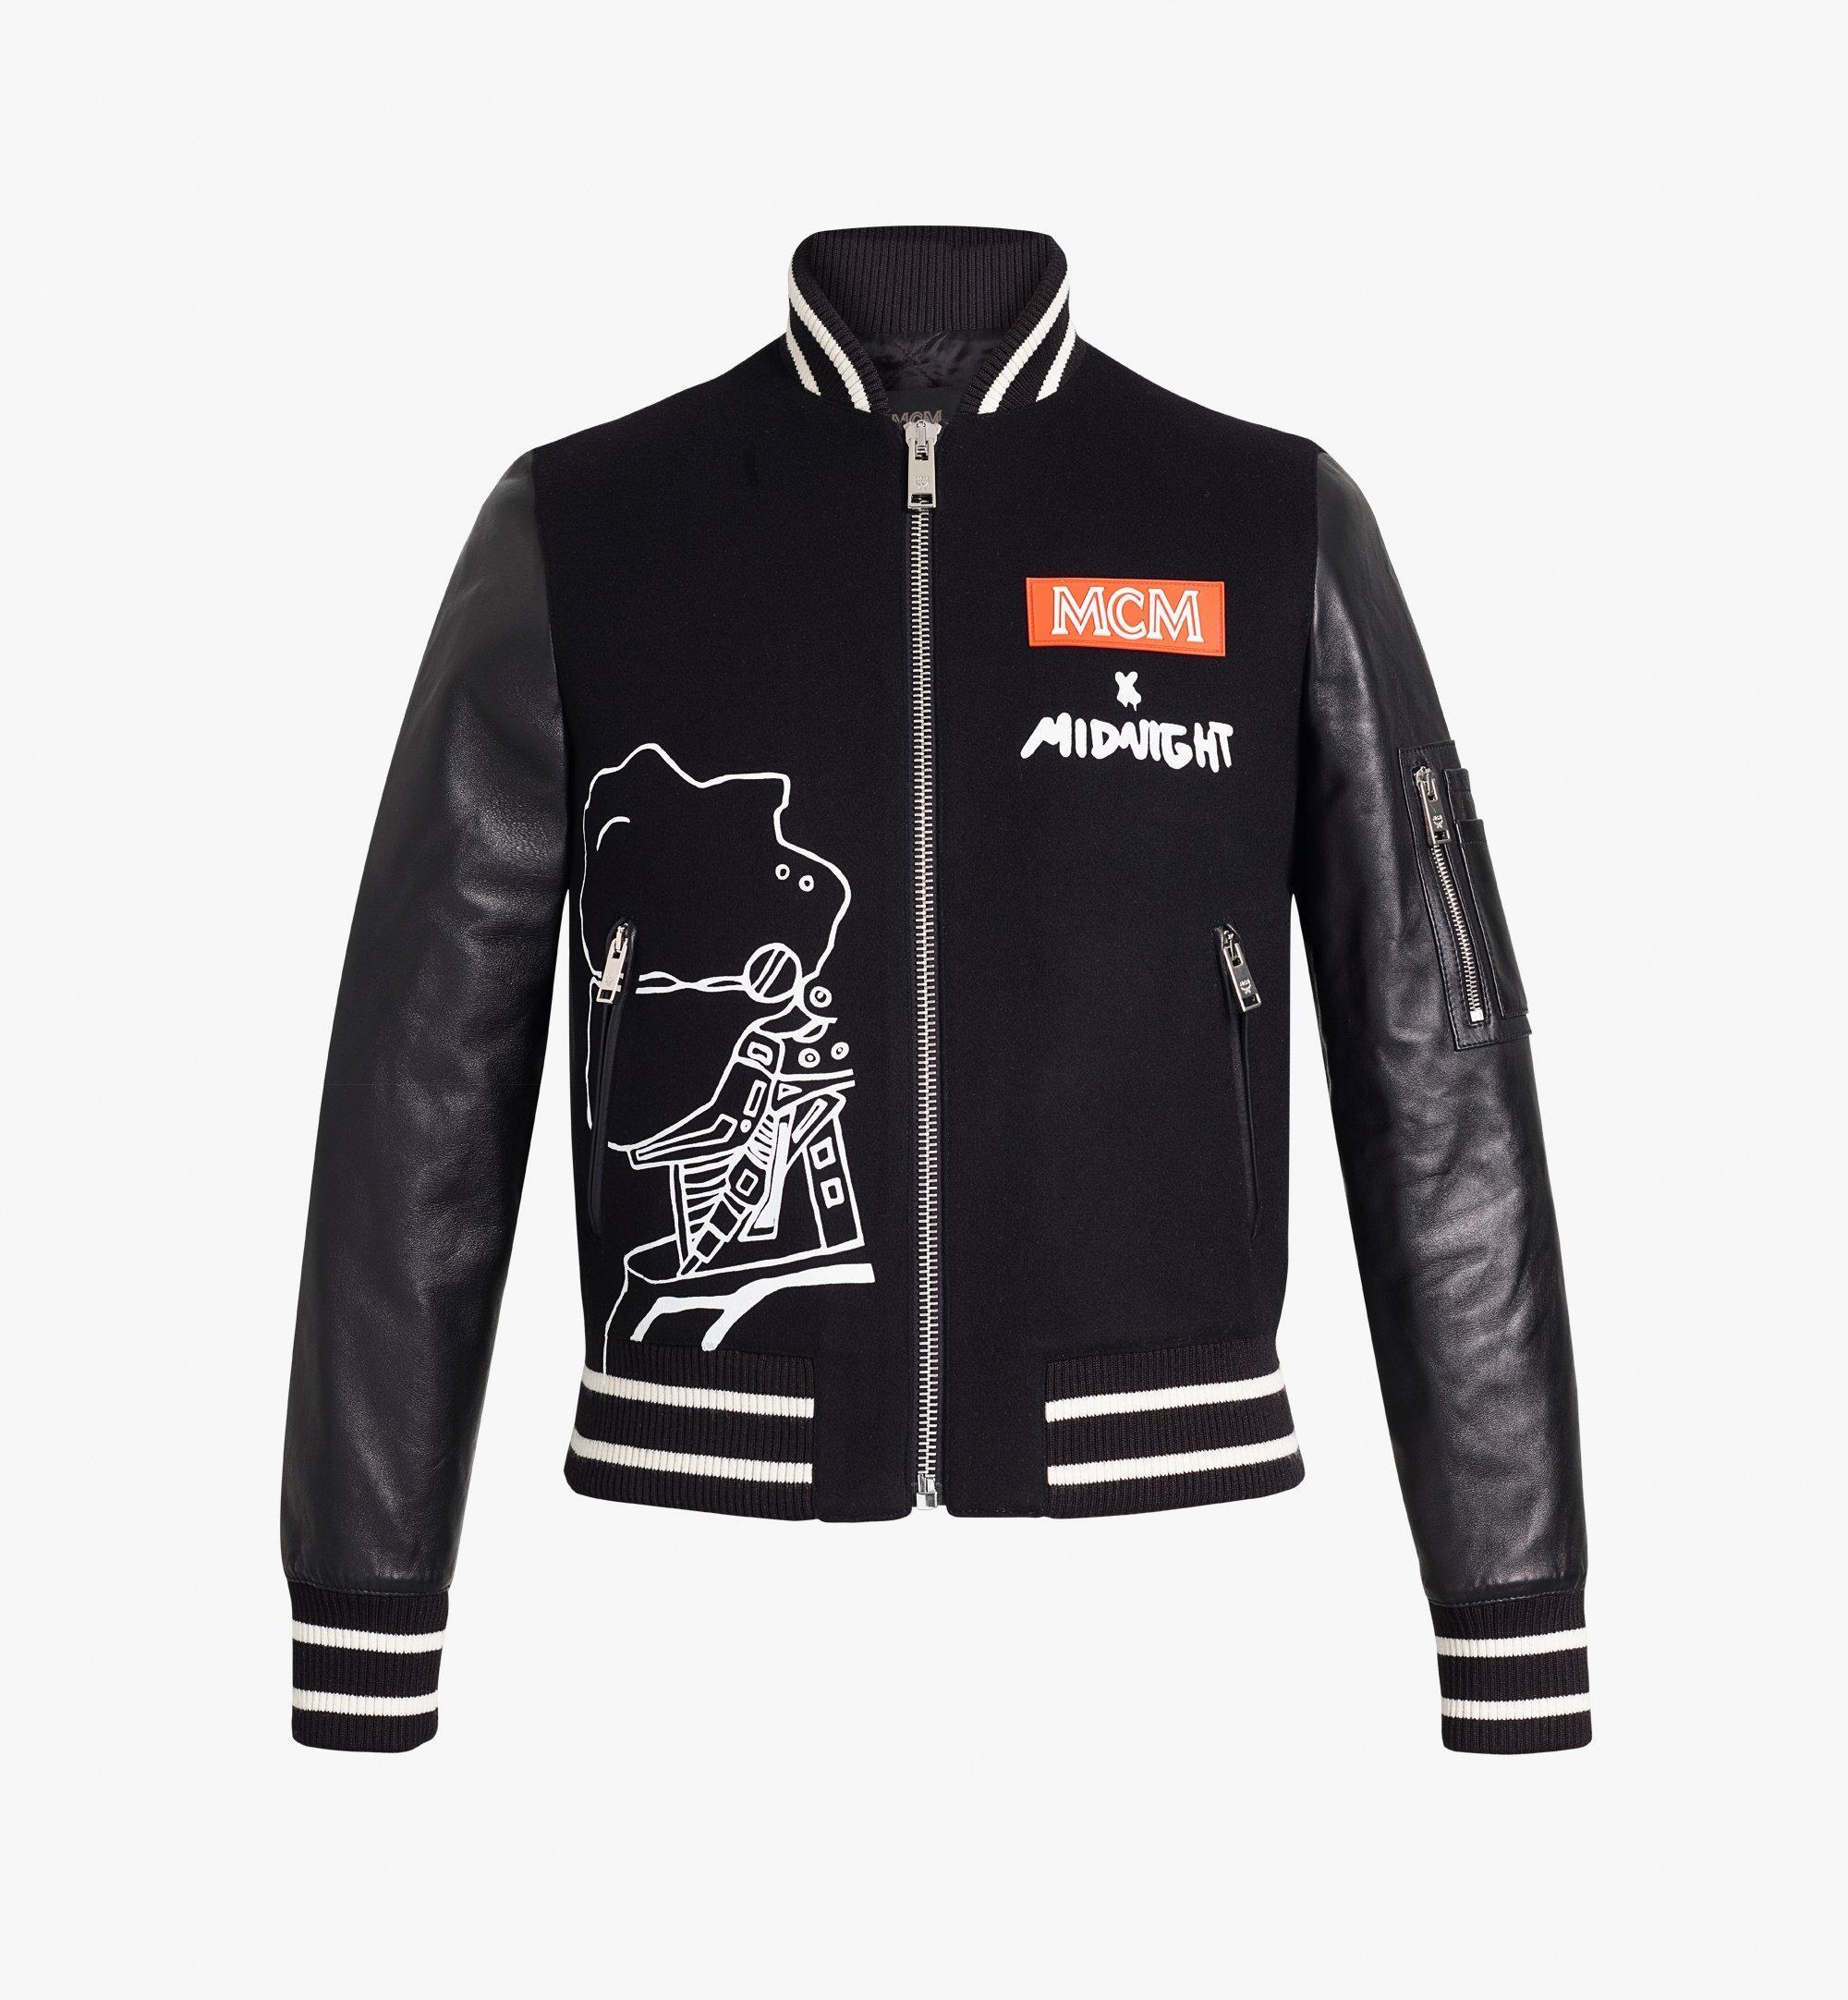 Women's MCM x Midnight Varsity Jacket